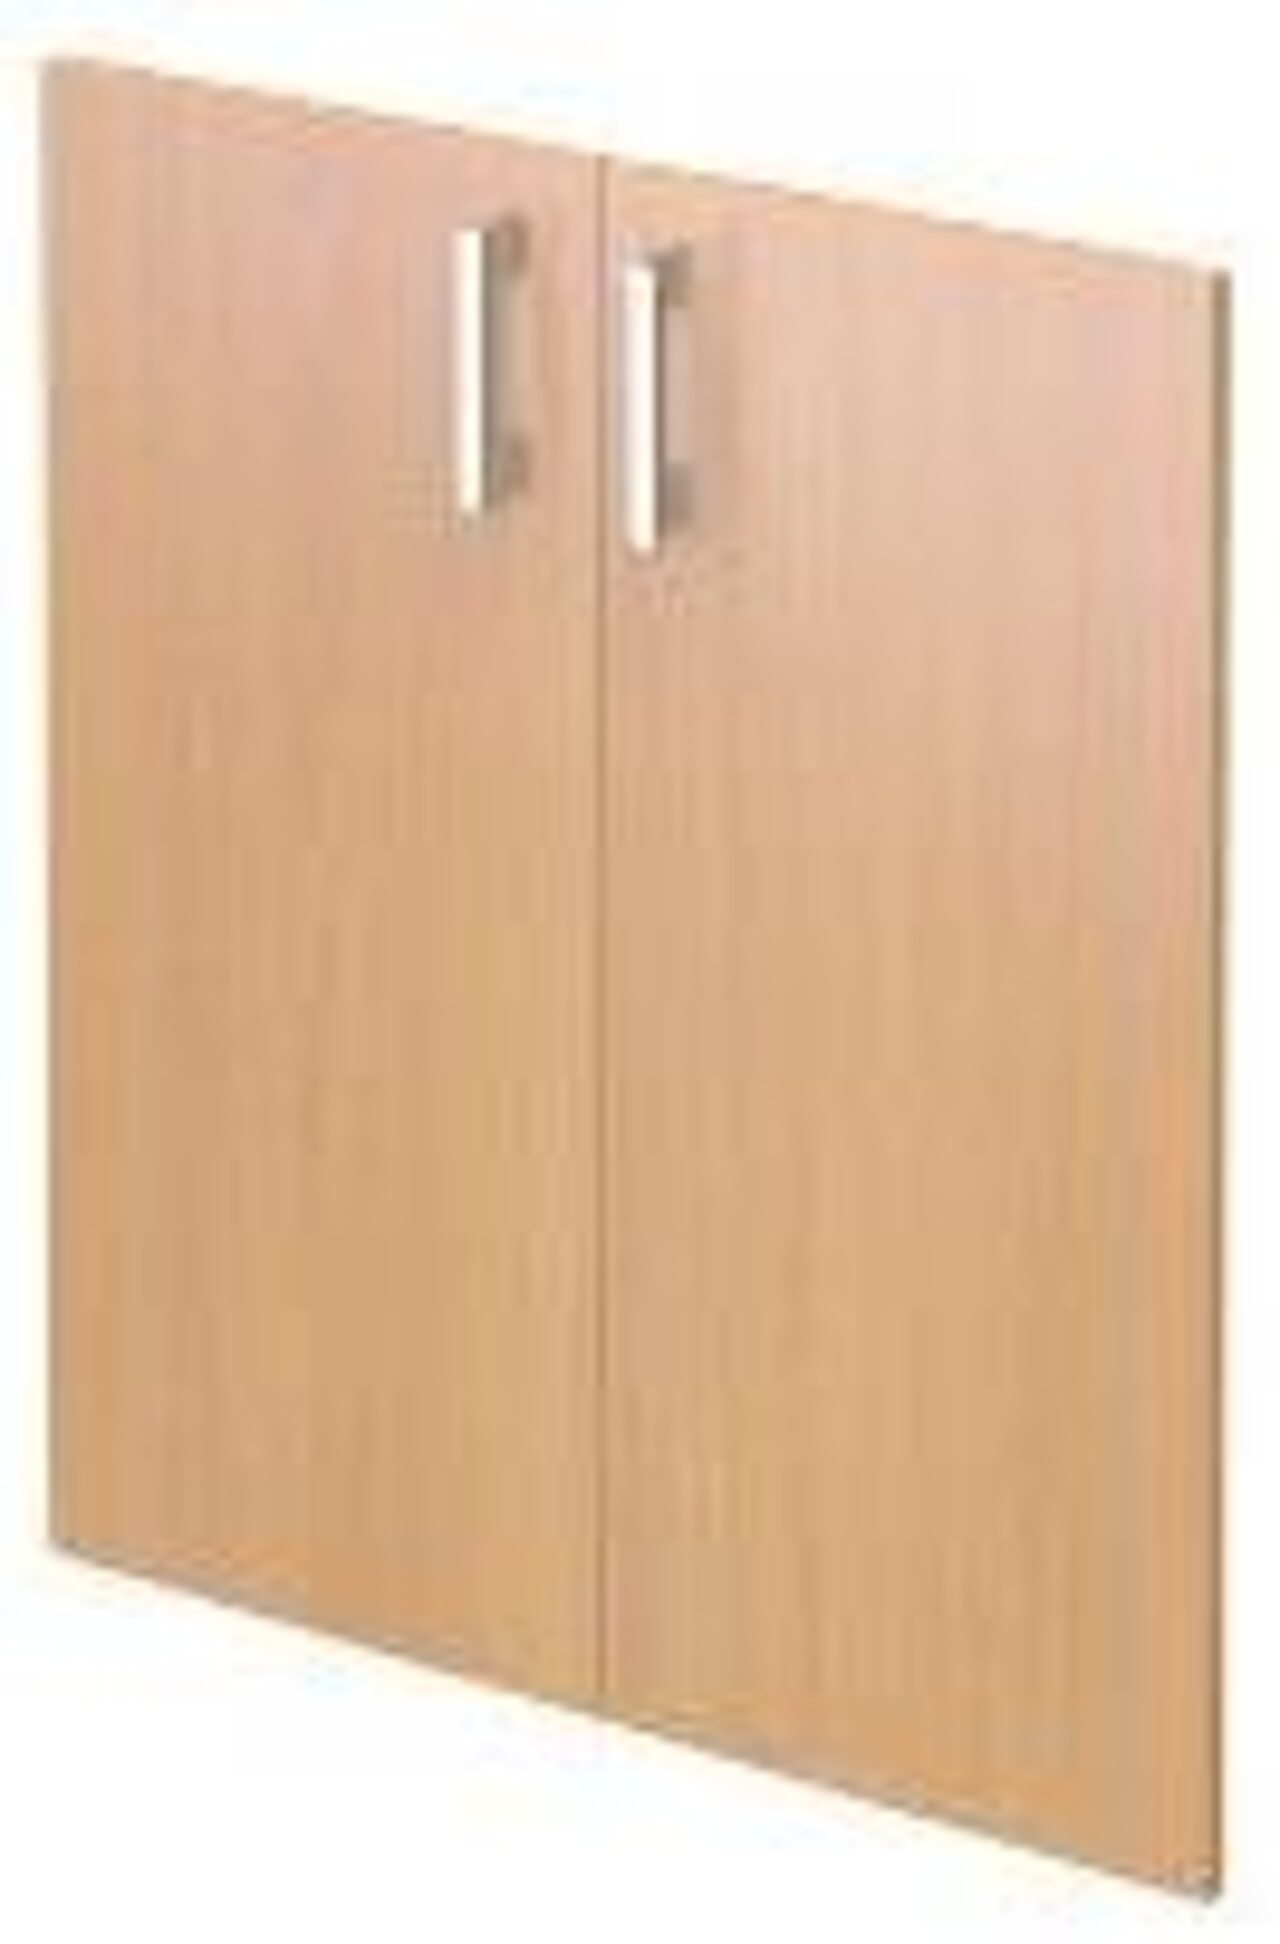 Двери для широких стеллажей - фото 6